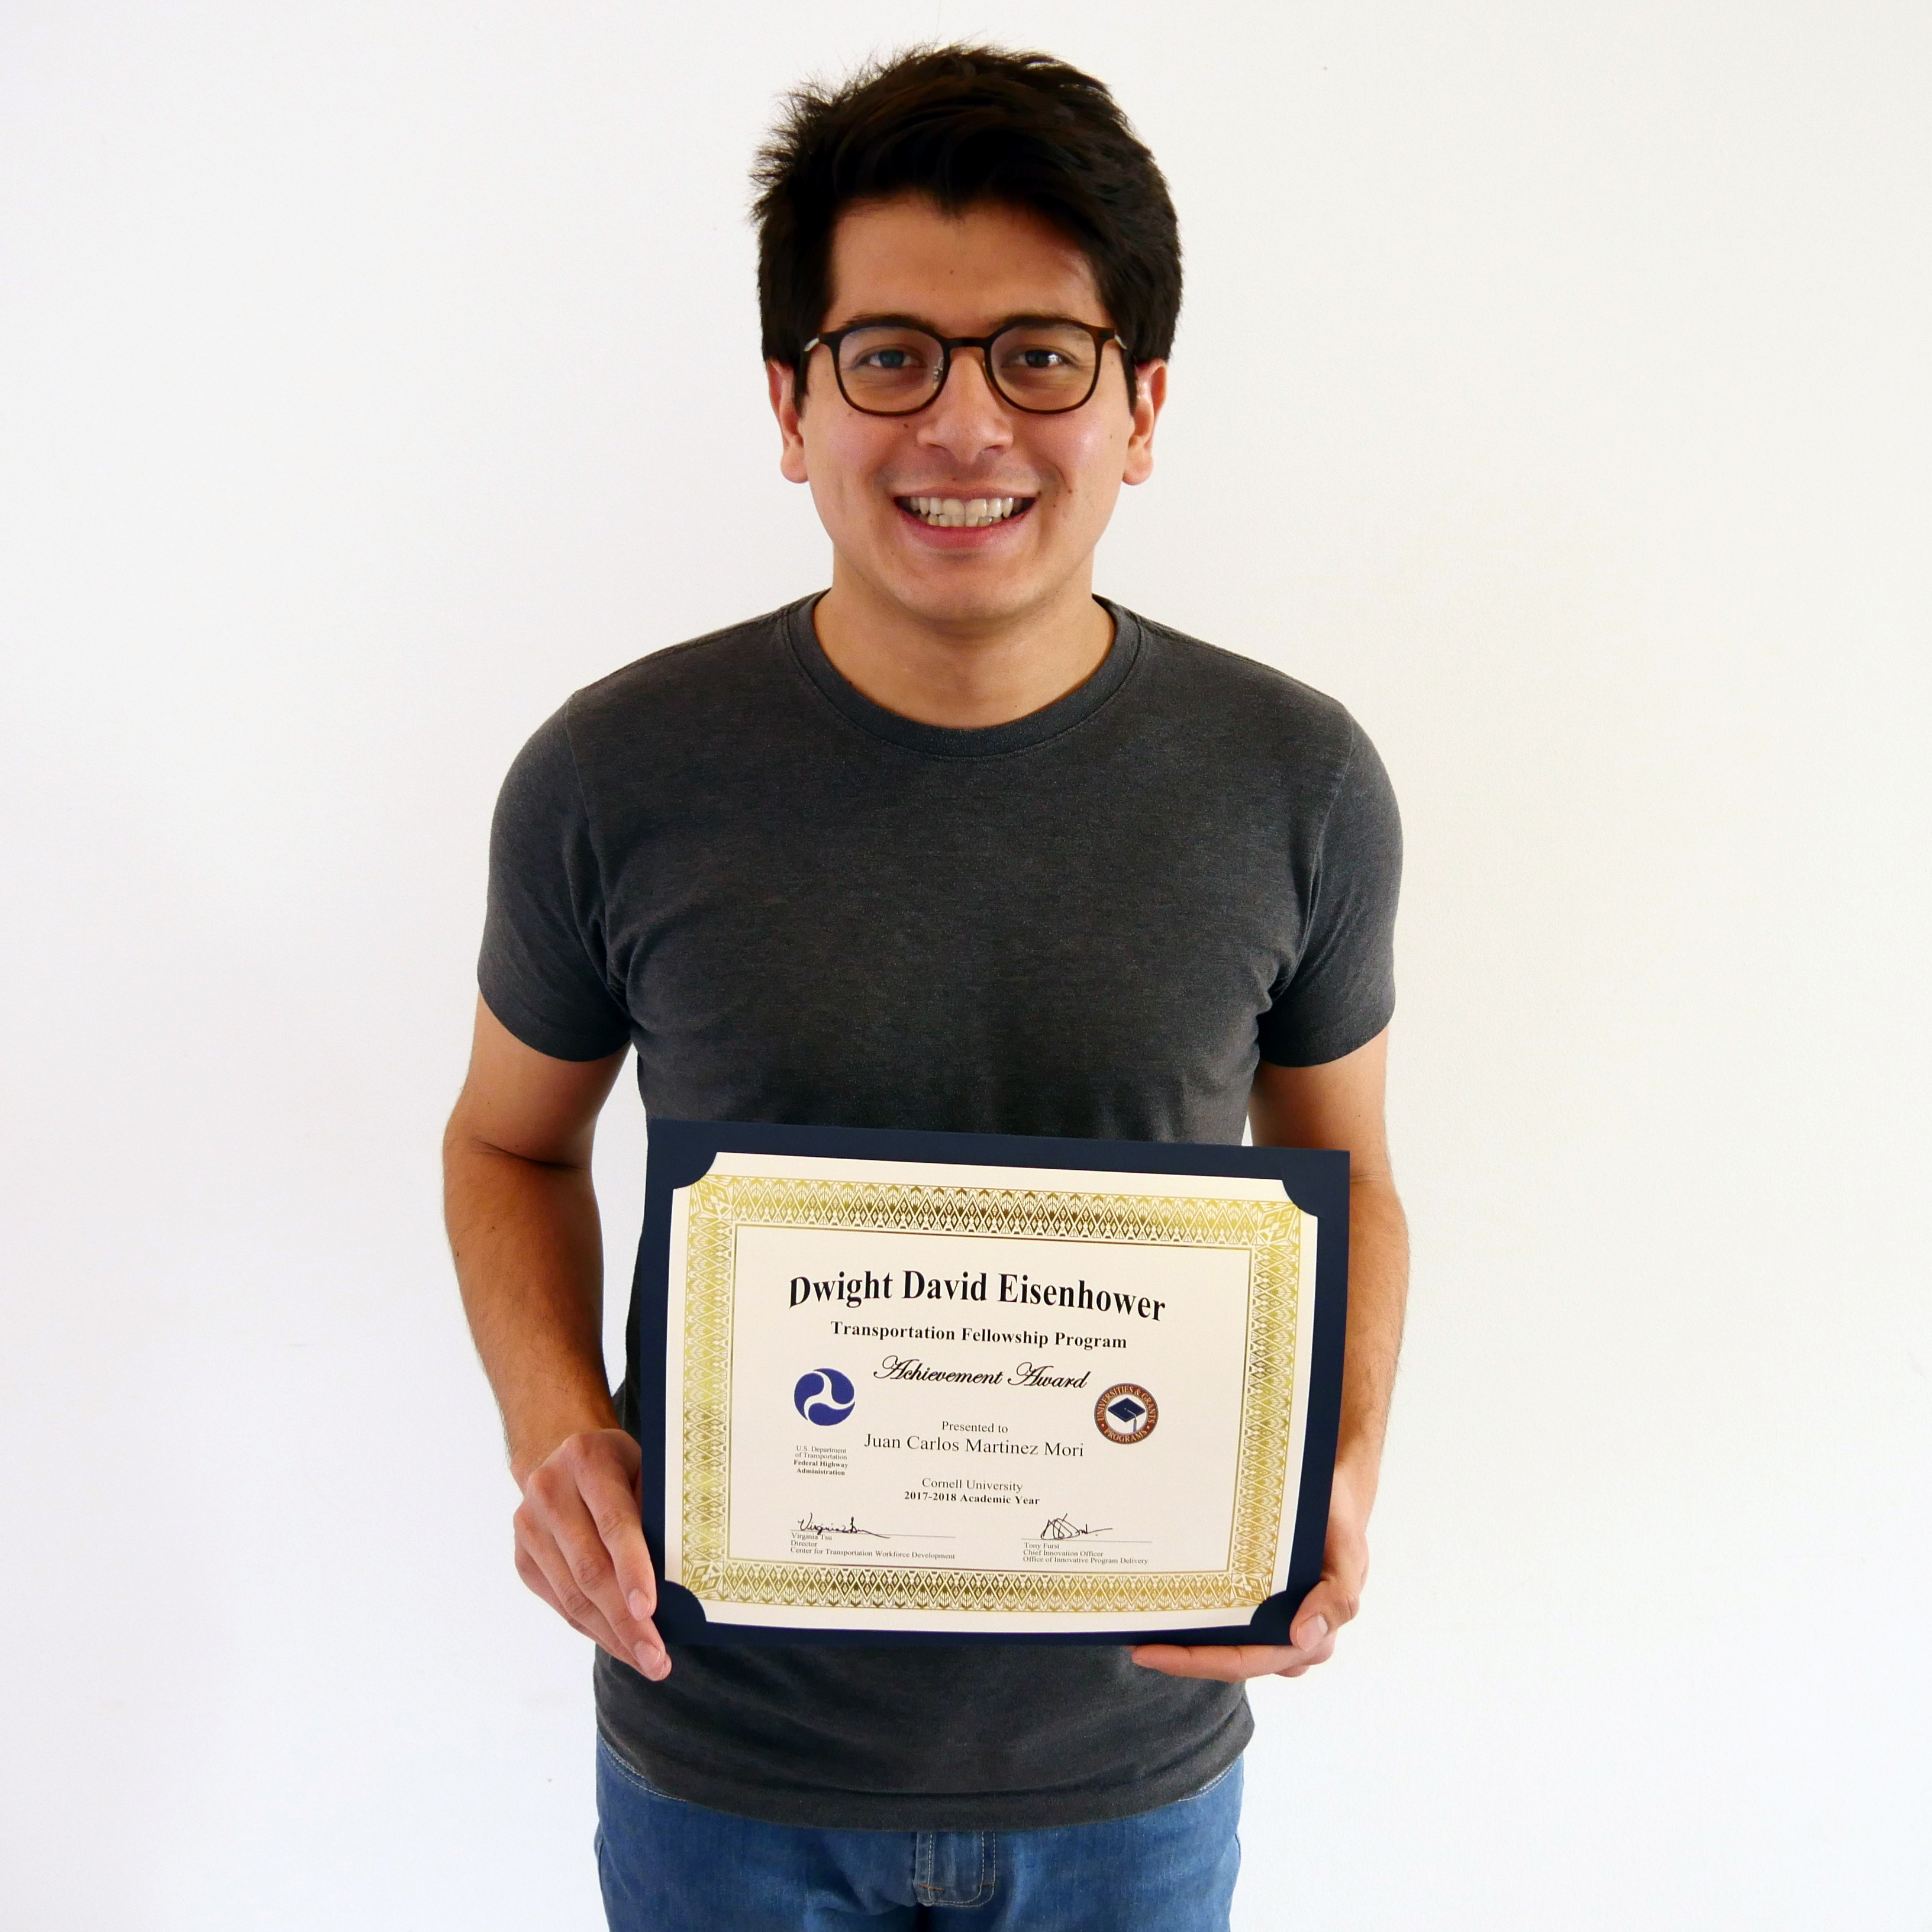 Juan Carlos Martínez Mori holds his DDETFP Award certificate